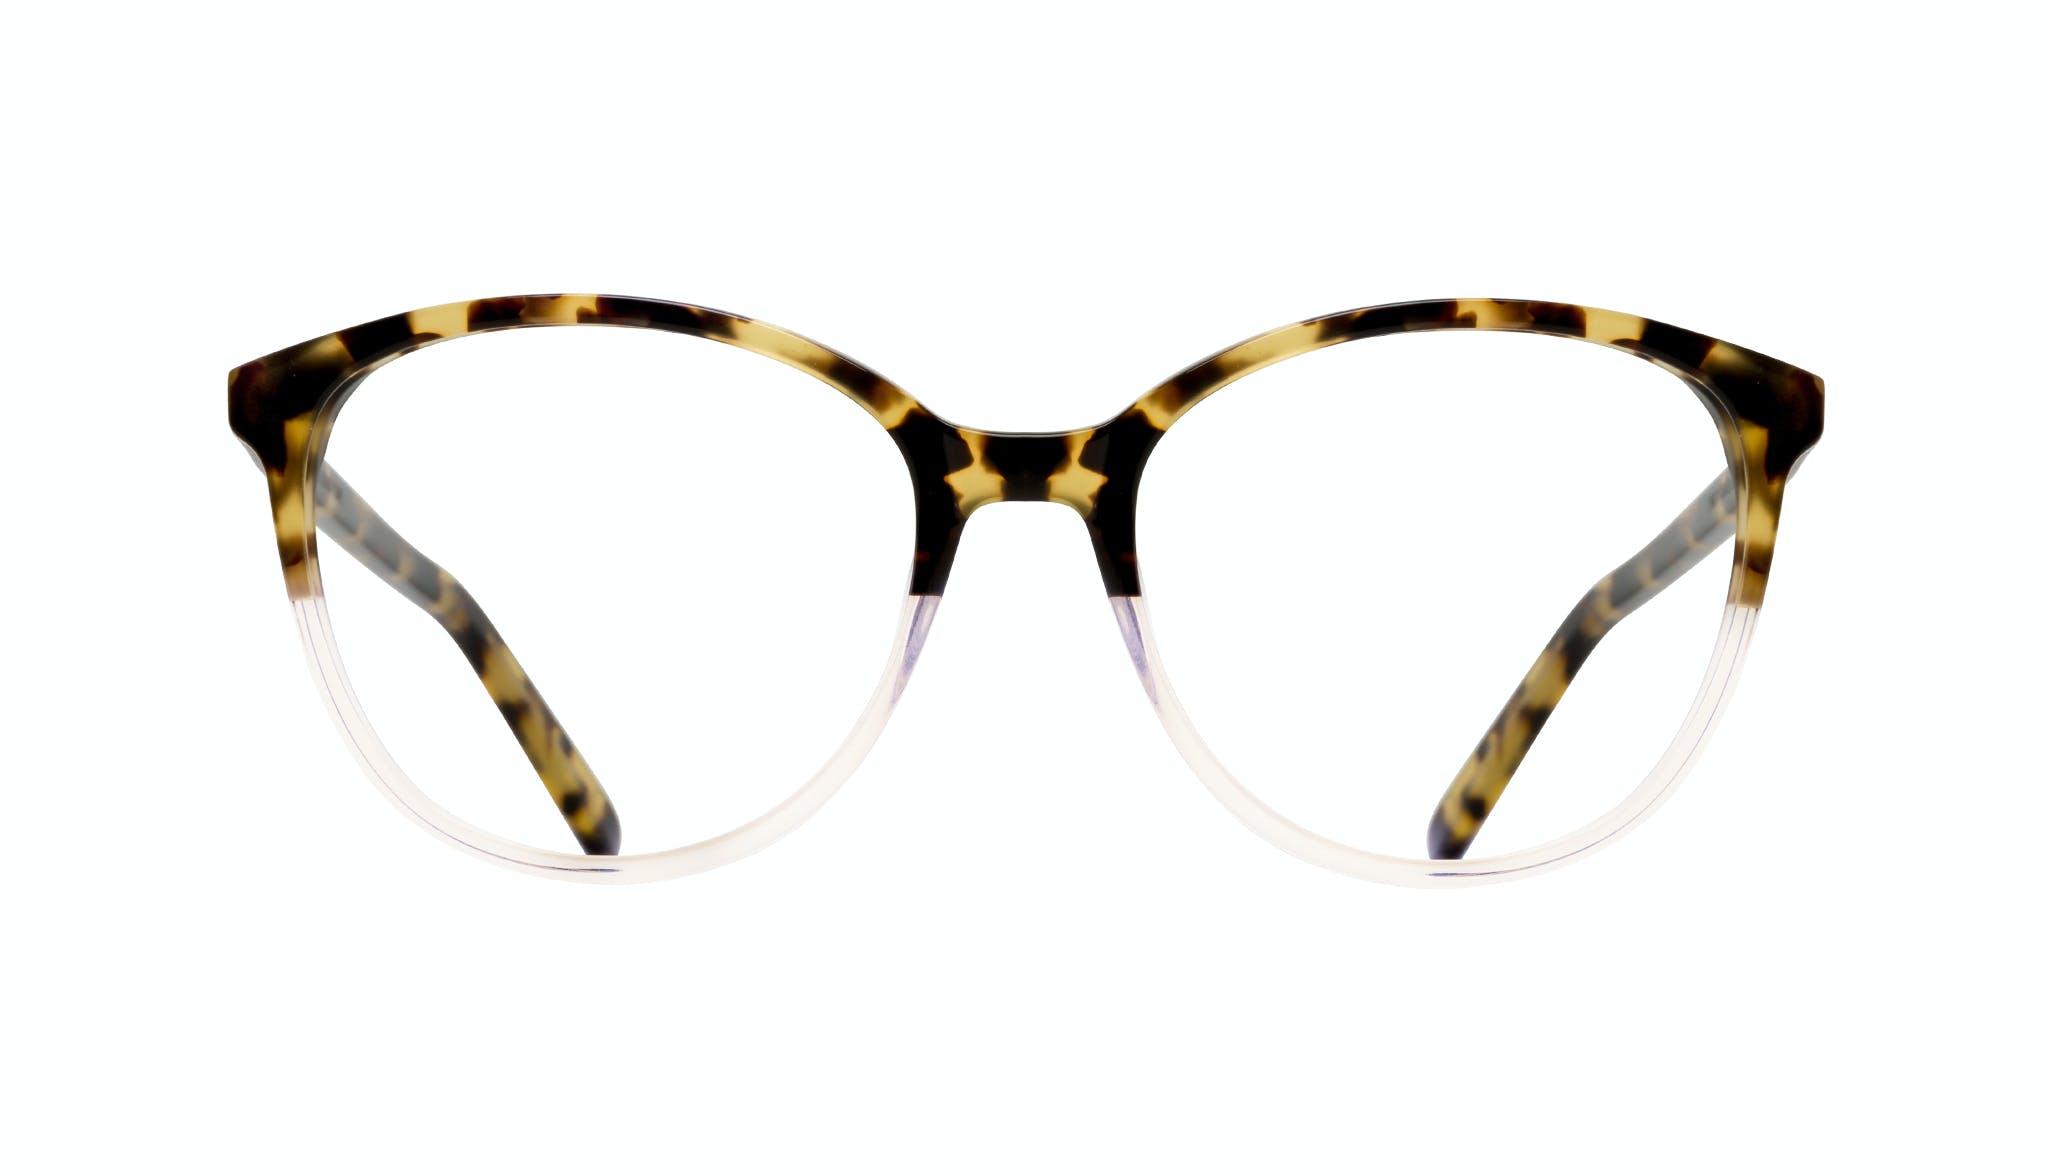 Affordable Fashion Glasses Cat Eye Round Eyeglasses Women Imagine Blond Tort Front